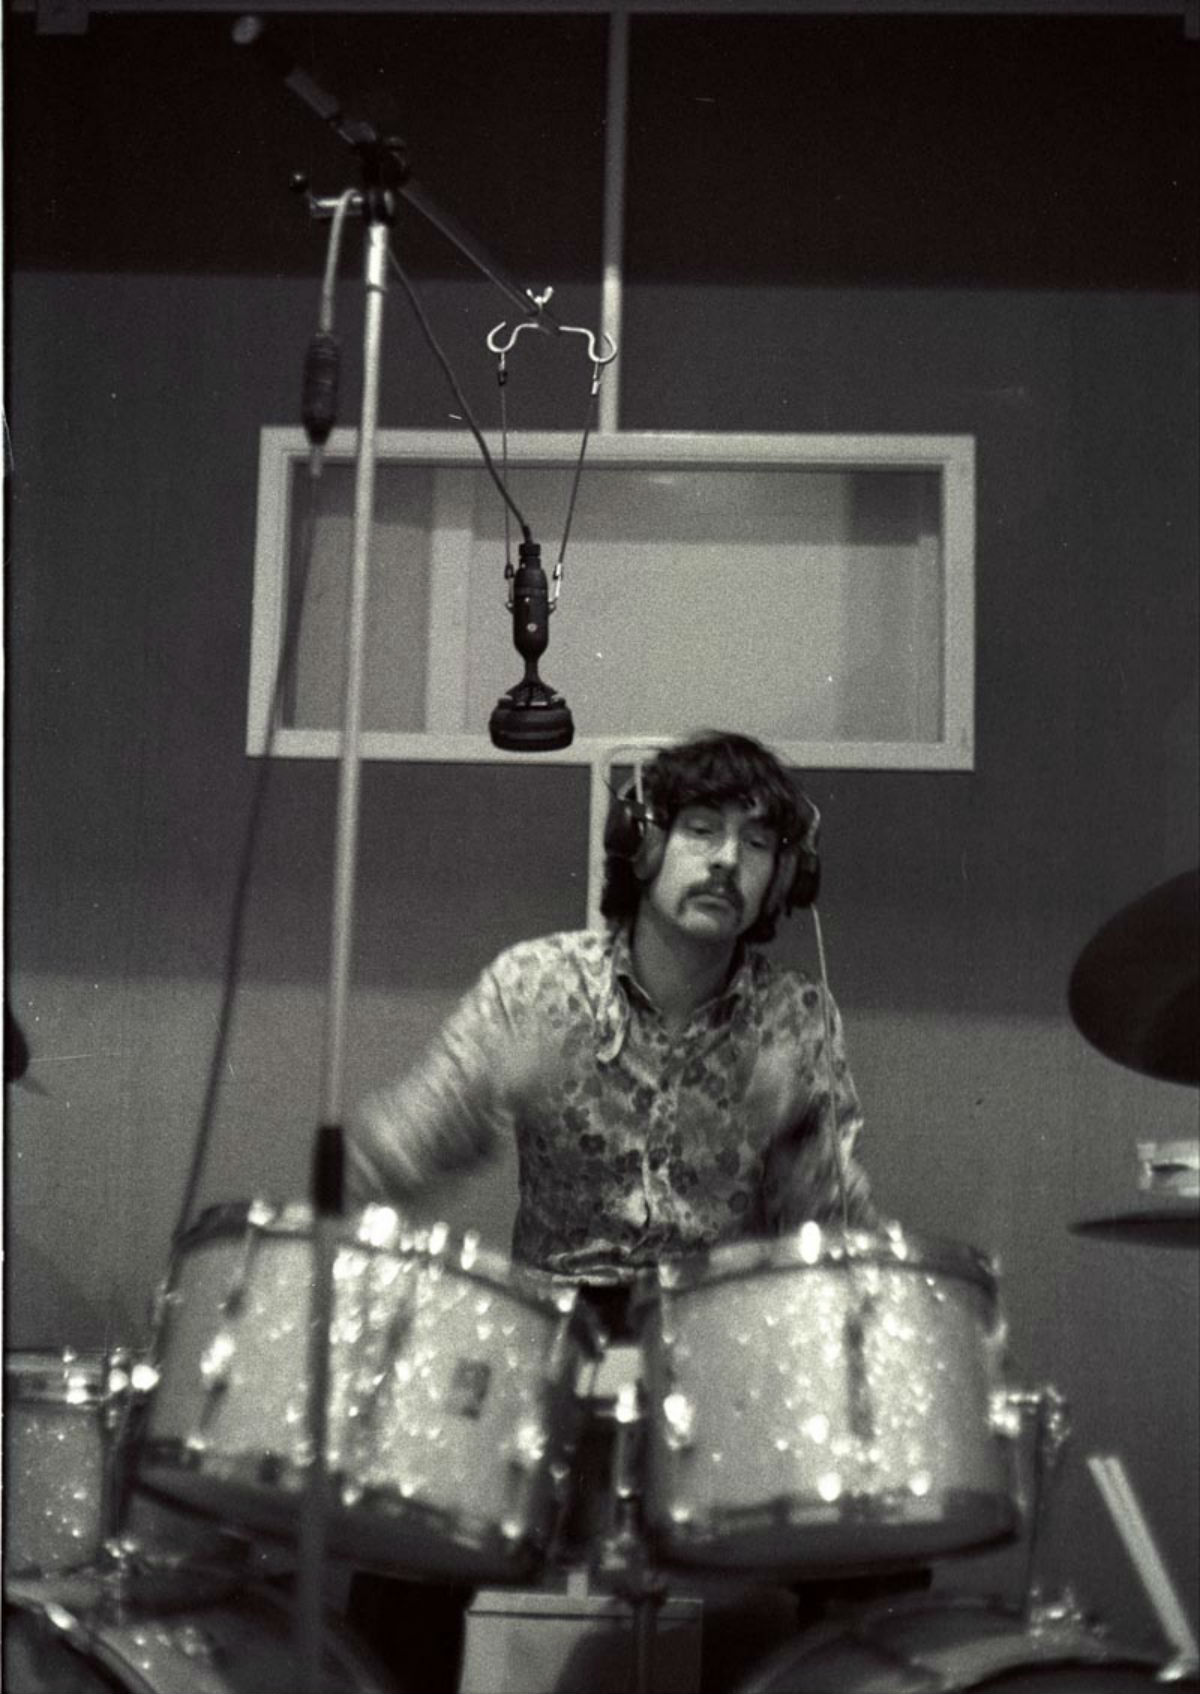 Pink Floyd - Their Mortal Remains